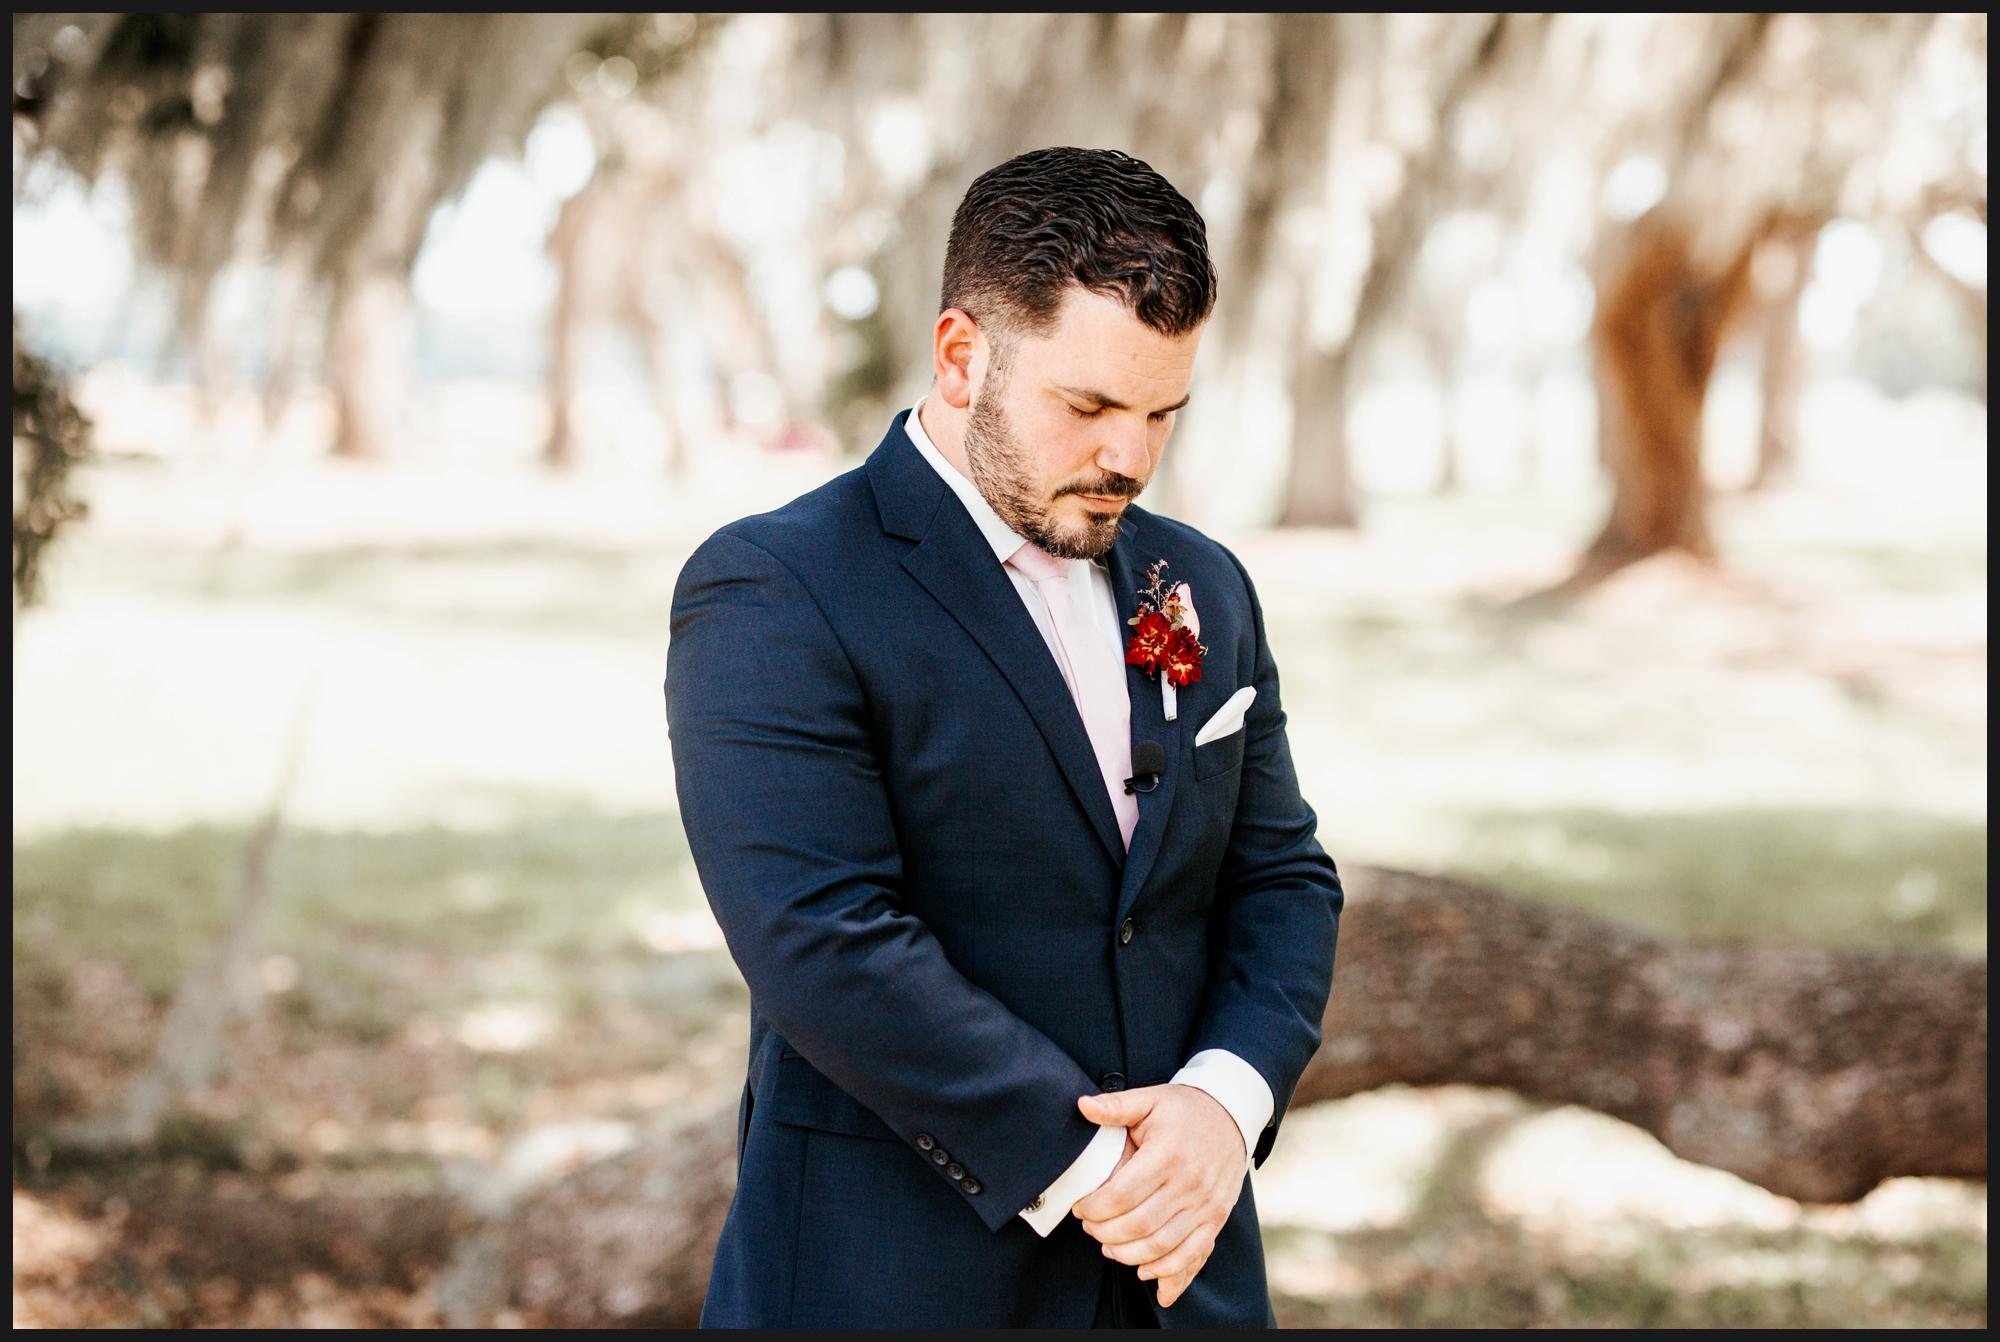 Orlando-Wedding-Photographer-destination-wedding-photographer-florida-wedding-photographer-hawaii-wedding-photographer_0574.jpg